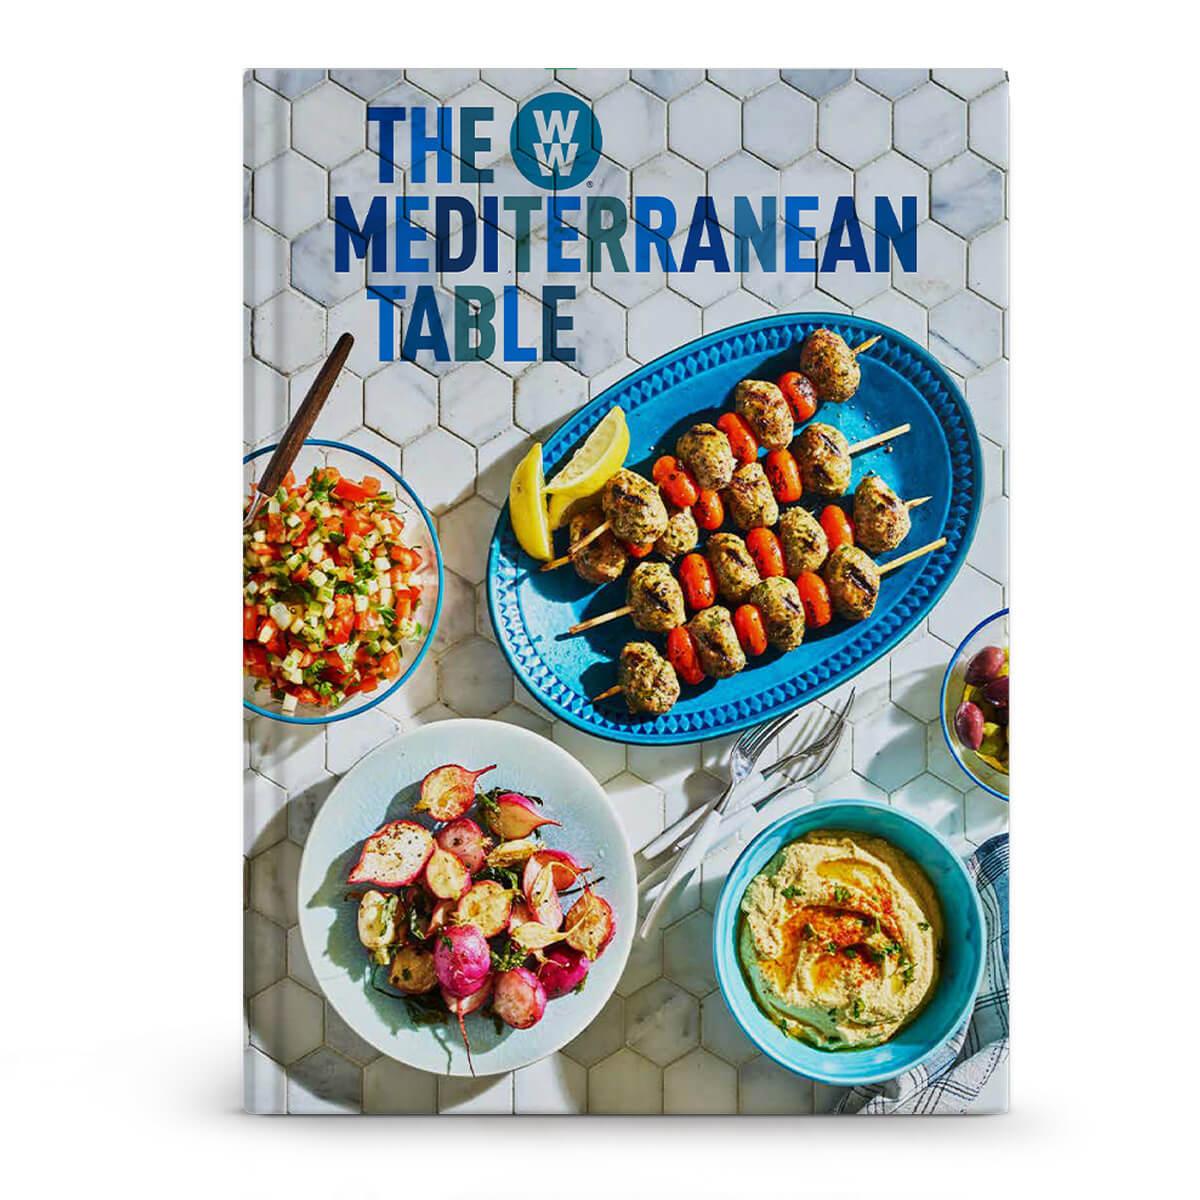 The Mediterranean Table Cookbook